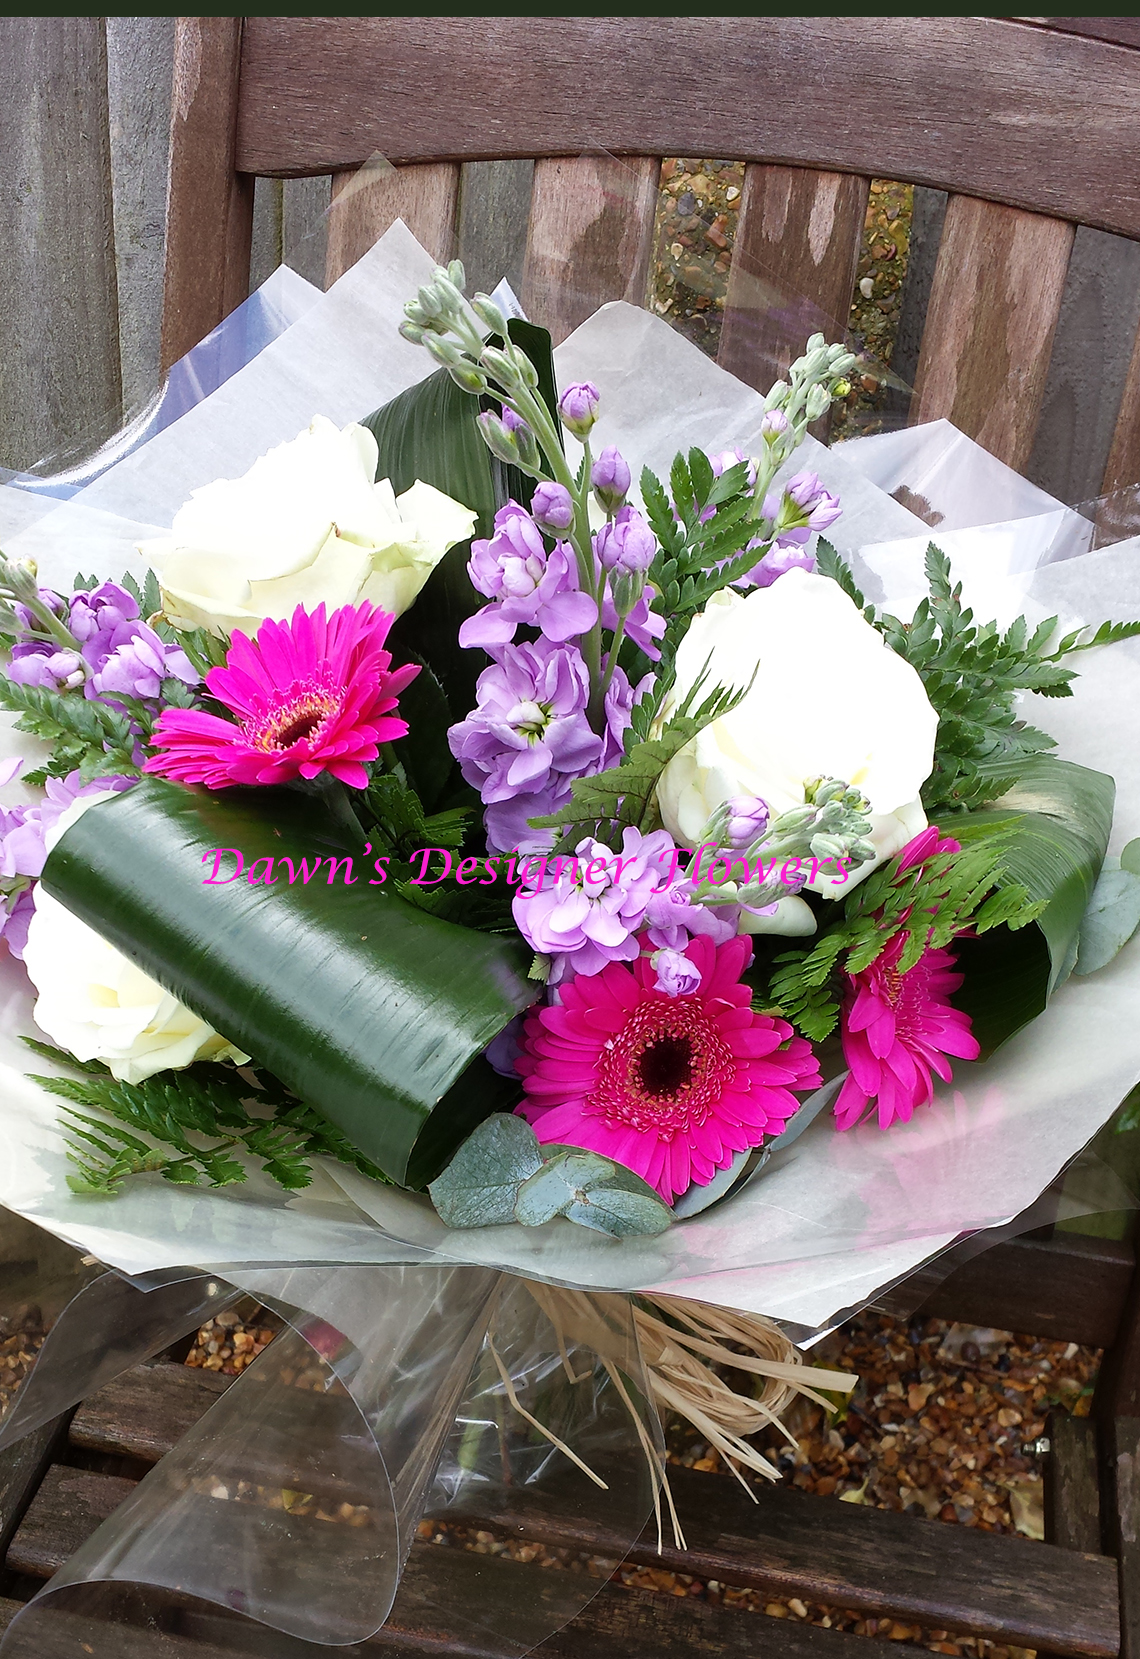 Birthday flowers flower delivery london 02087489766 hammersmith birthday flowers flower delivery london 02087489766 hammersmith chiswick izmirmasajfo